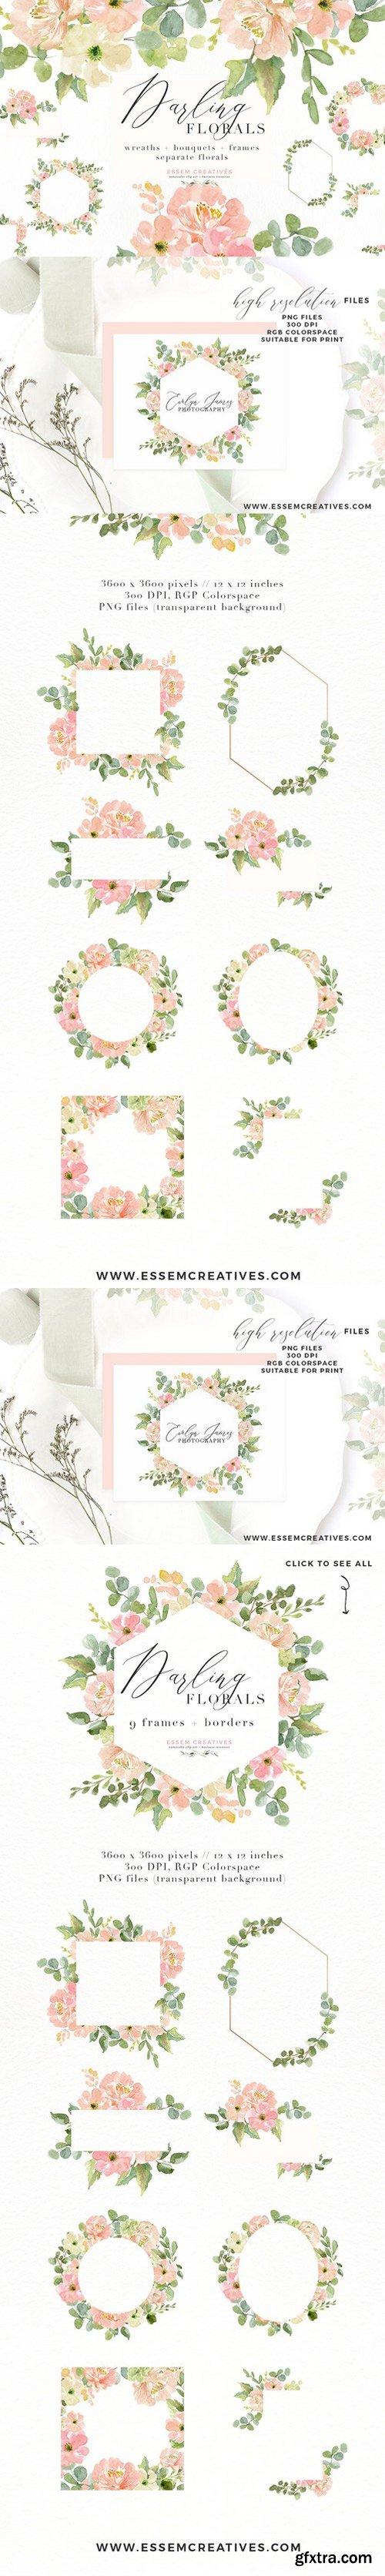 CM - Wedding Invite Watercolor Flower PNG 2402689